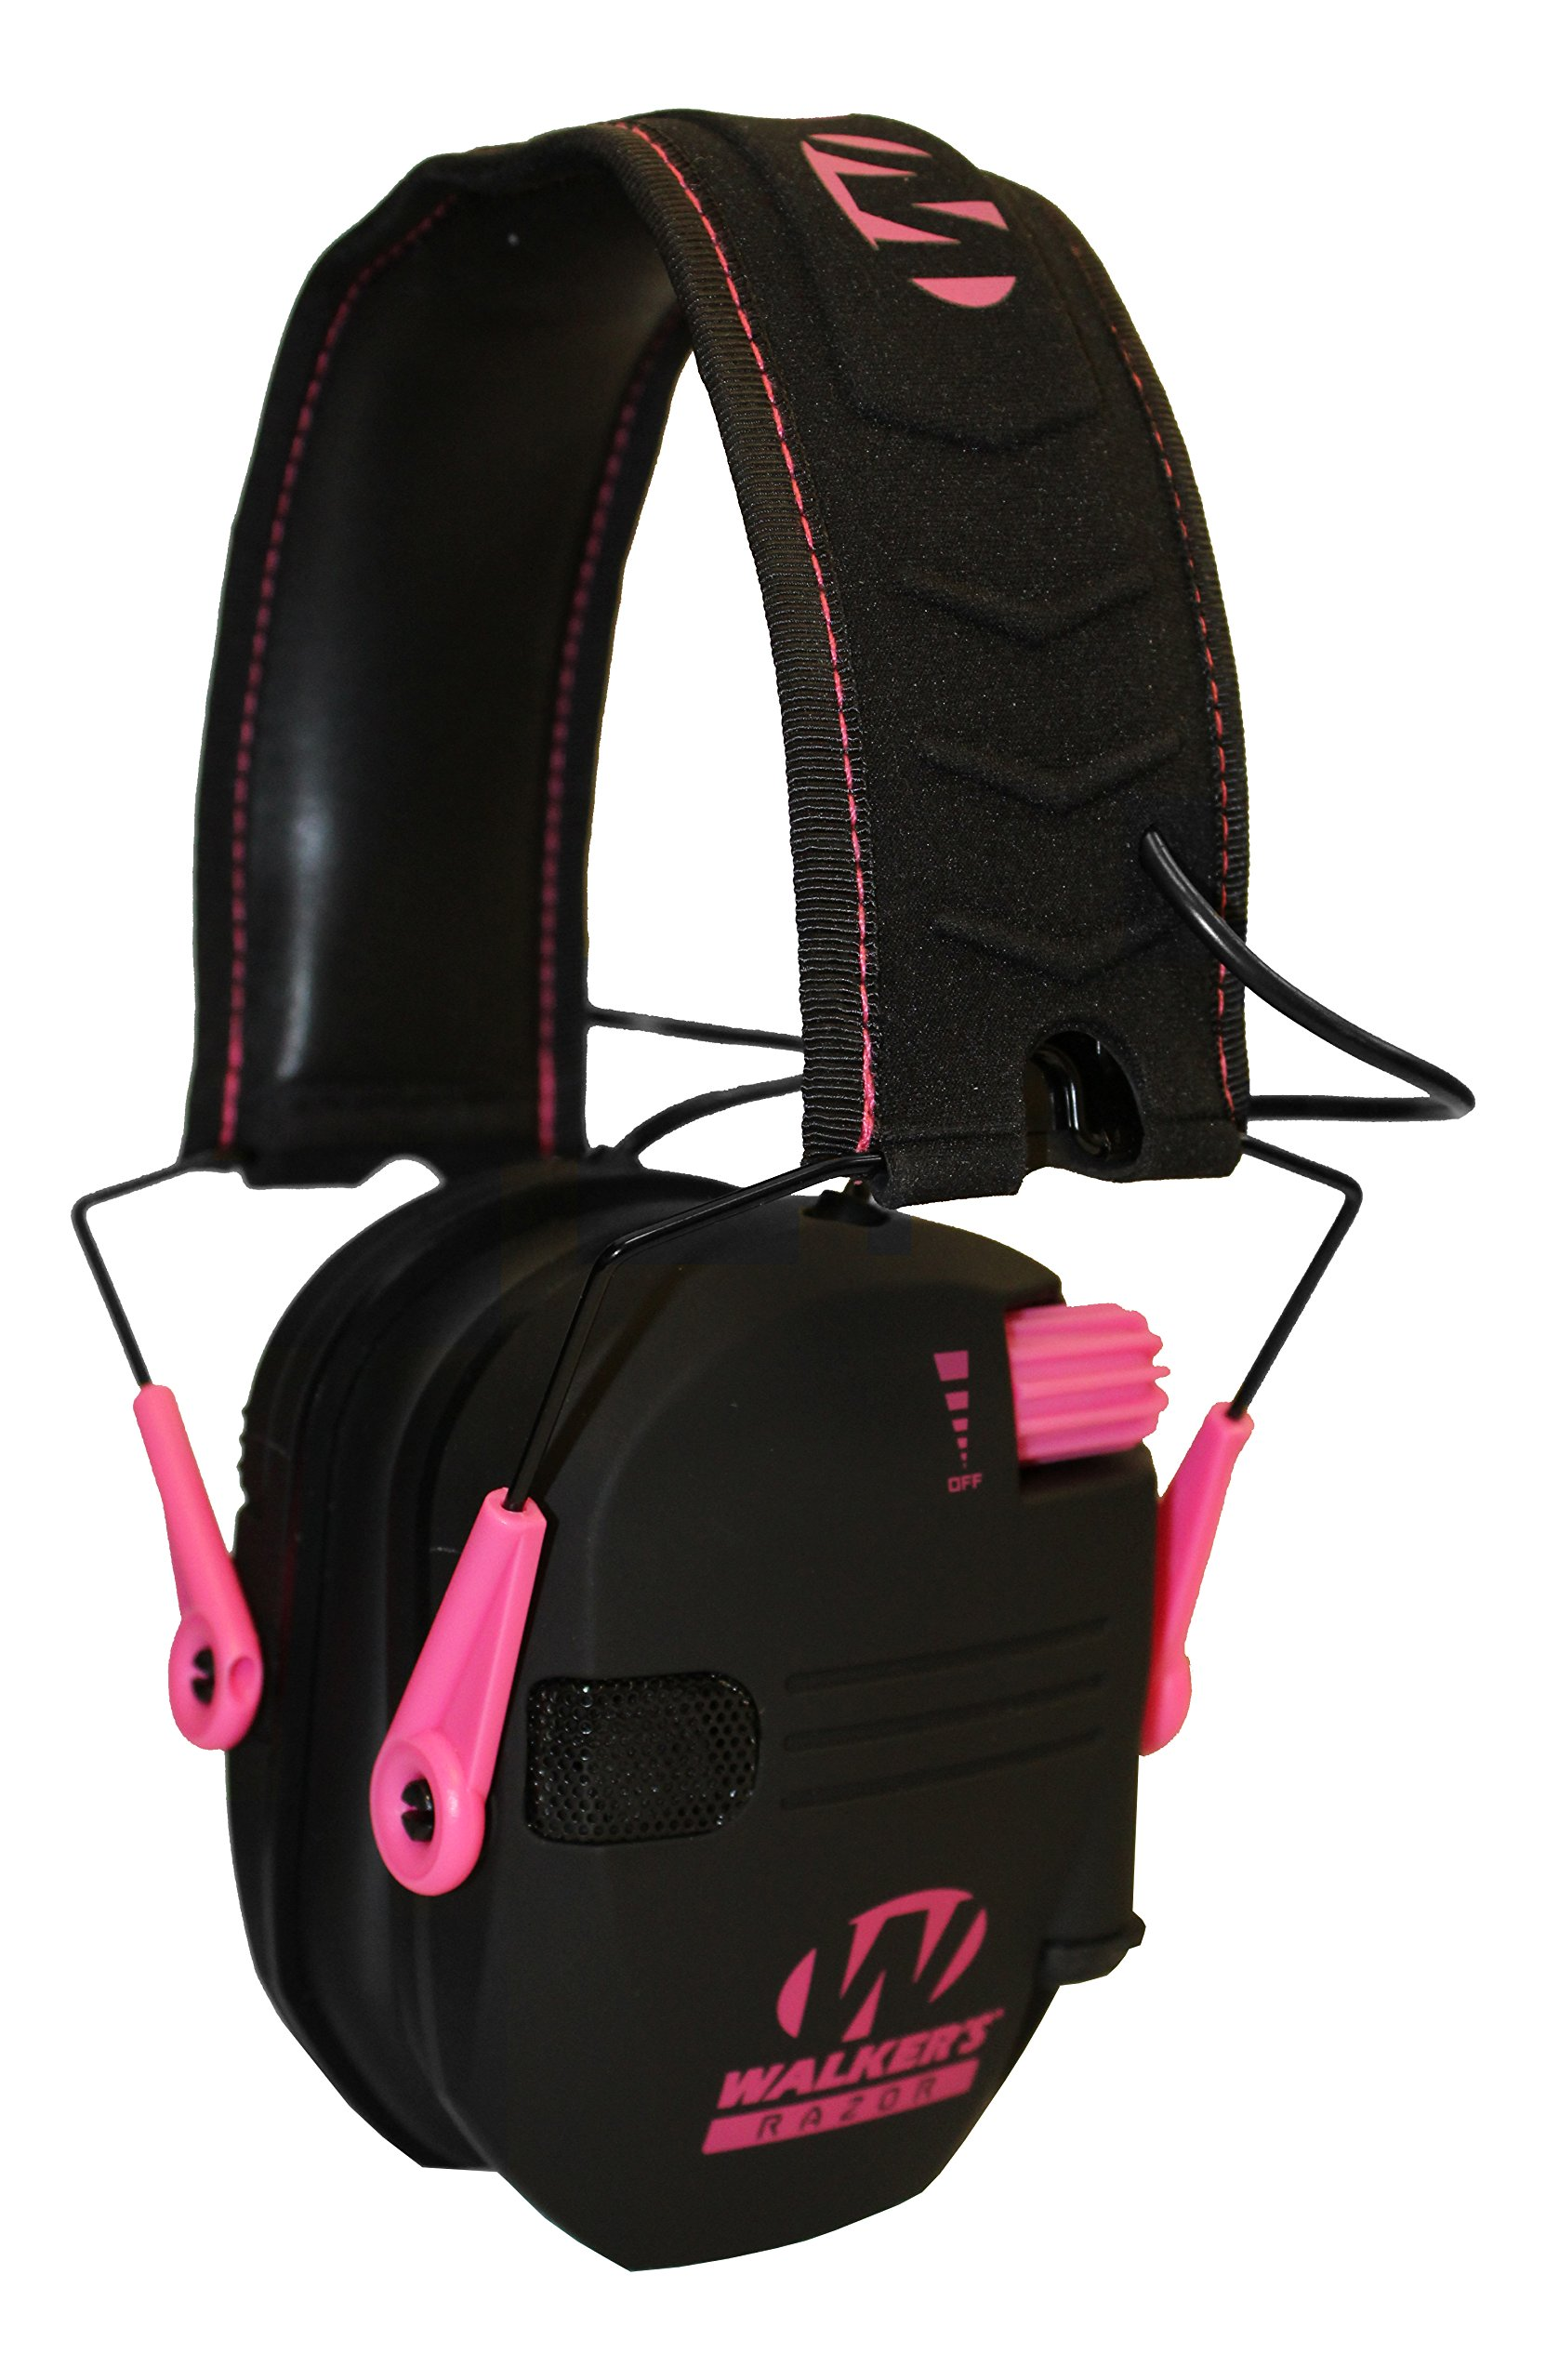 Walker's Razor Slim Electronic Muff - Pink